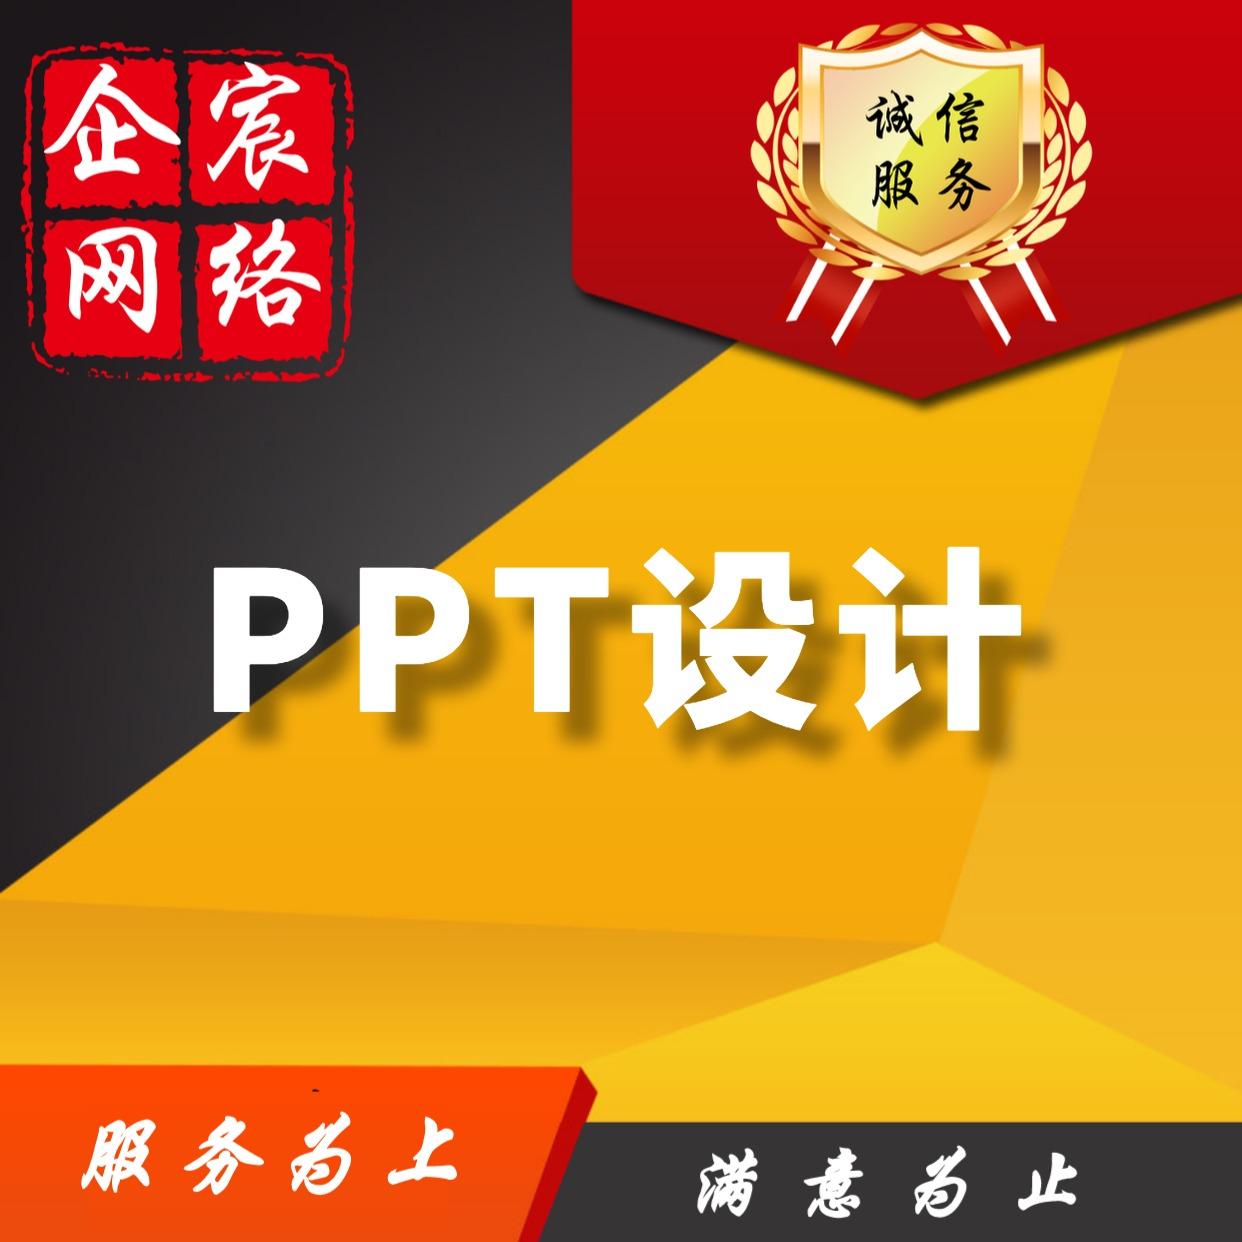 【PPT制作设计】PPT美化修改/PPT策划/工作汇报发布会